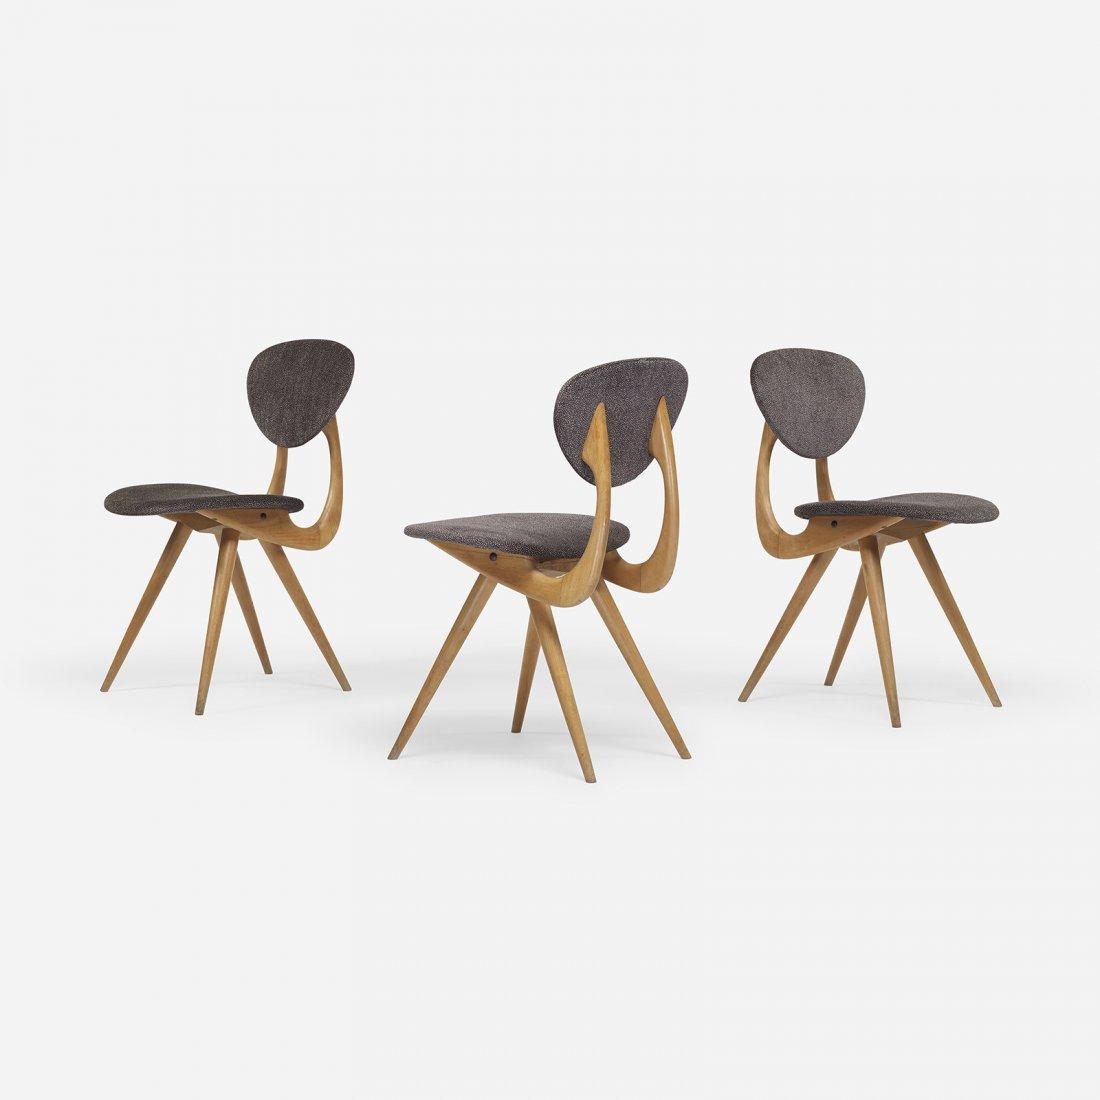 Italian chairs, set of three